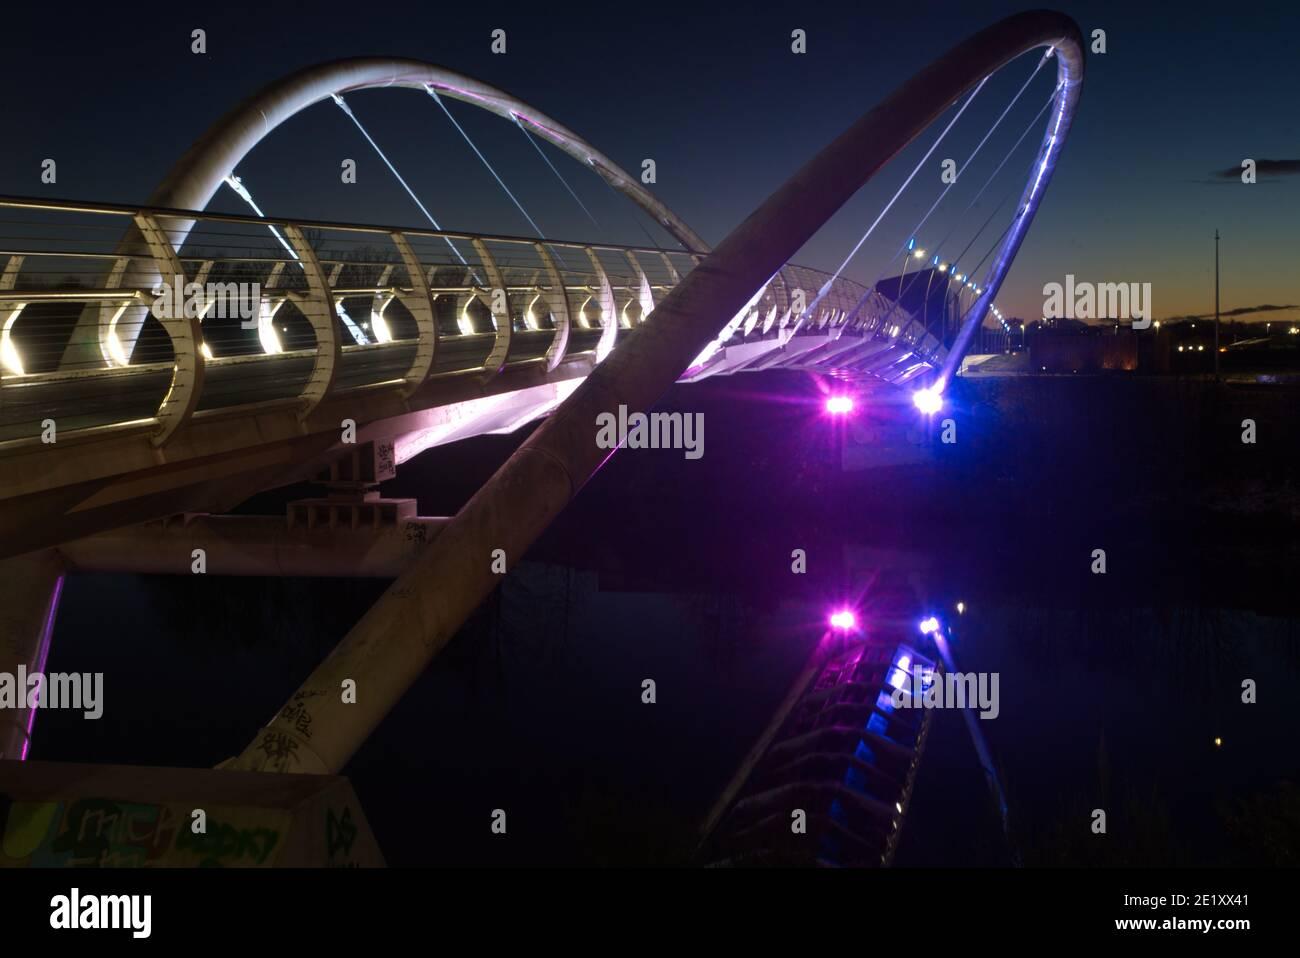 Die Clyde SmartBridge in Glasgow, Dalmarnock Smart Bridge. Stockfoto